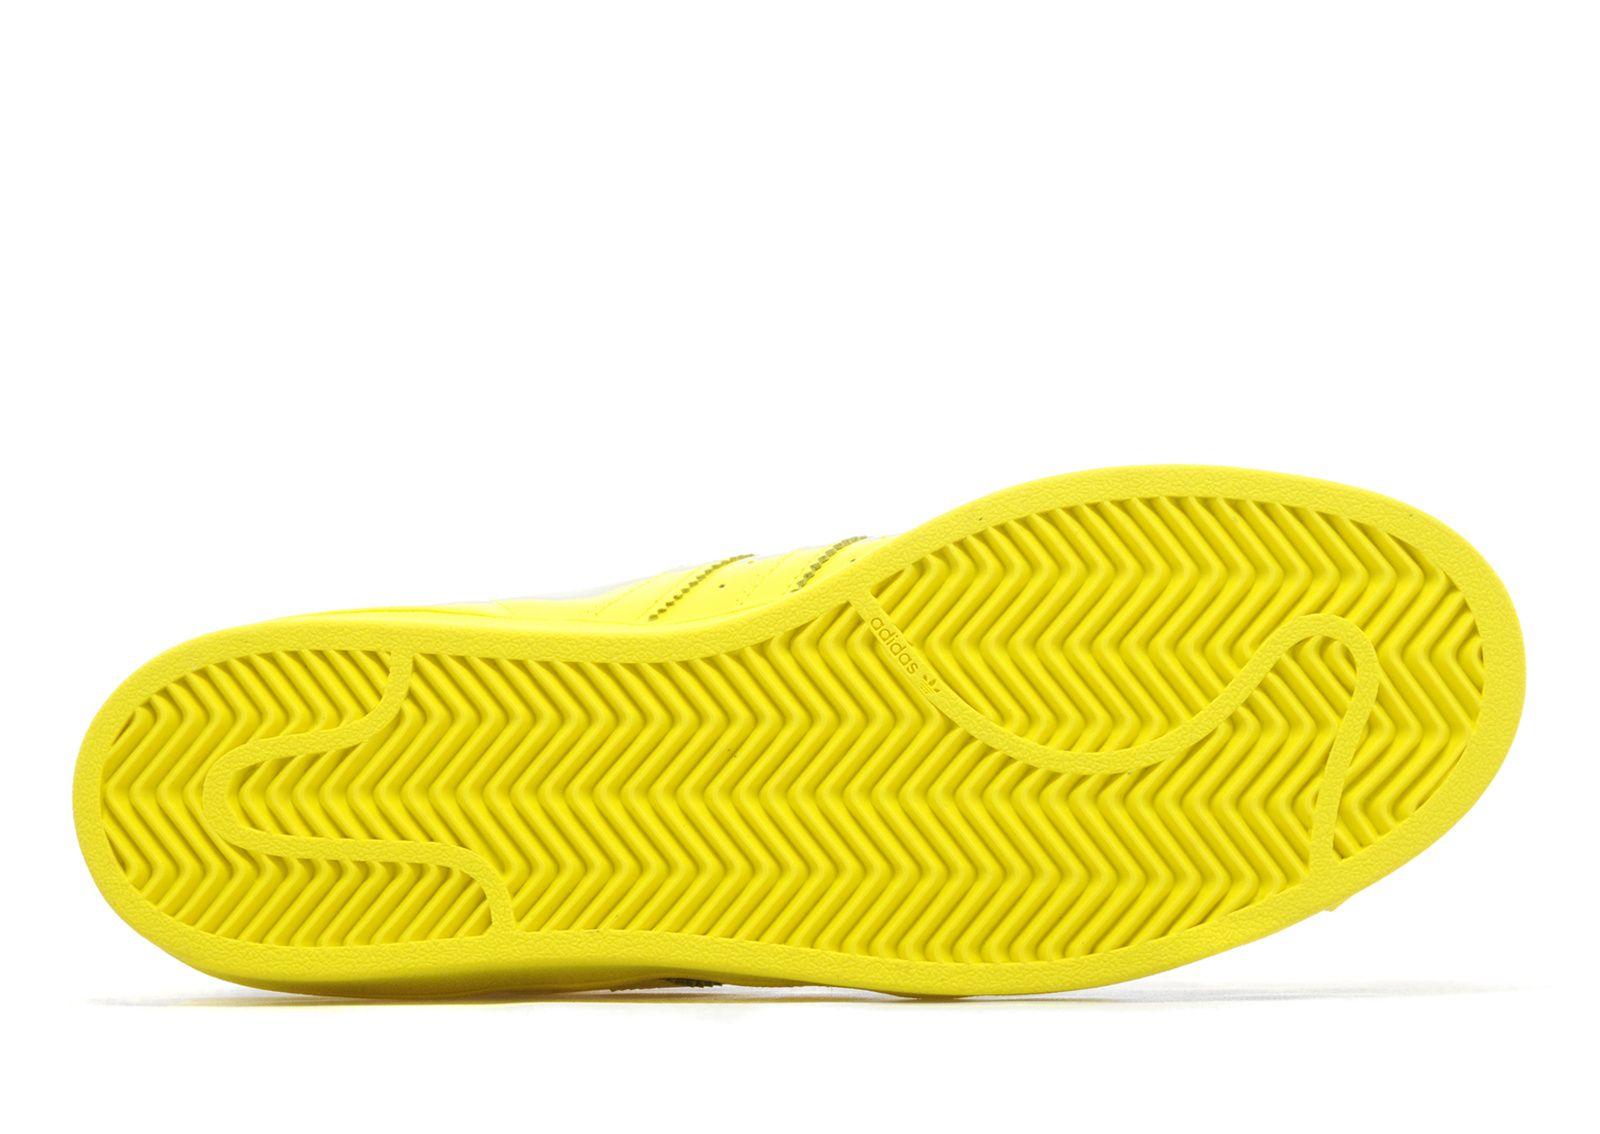 adidas Originals x Pharrell Williams Superstar 'Supercolor'